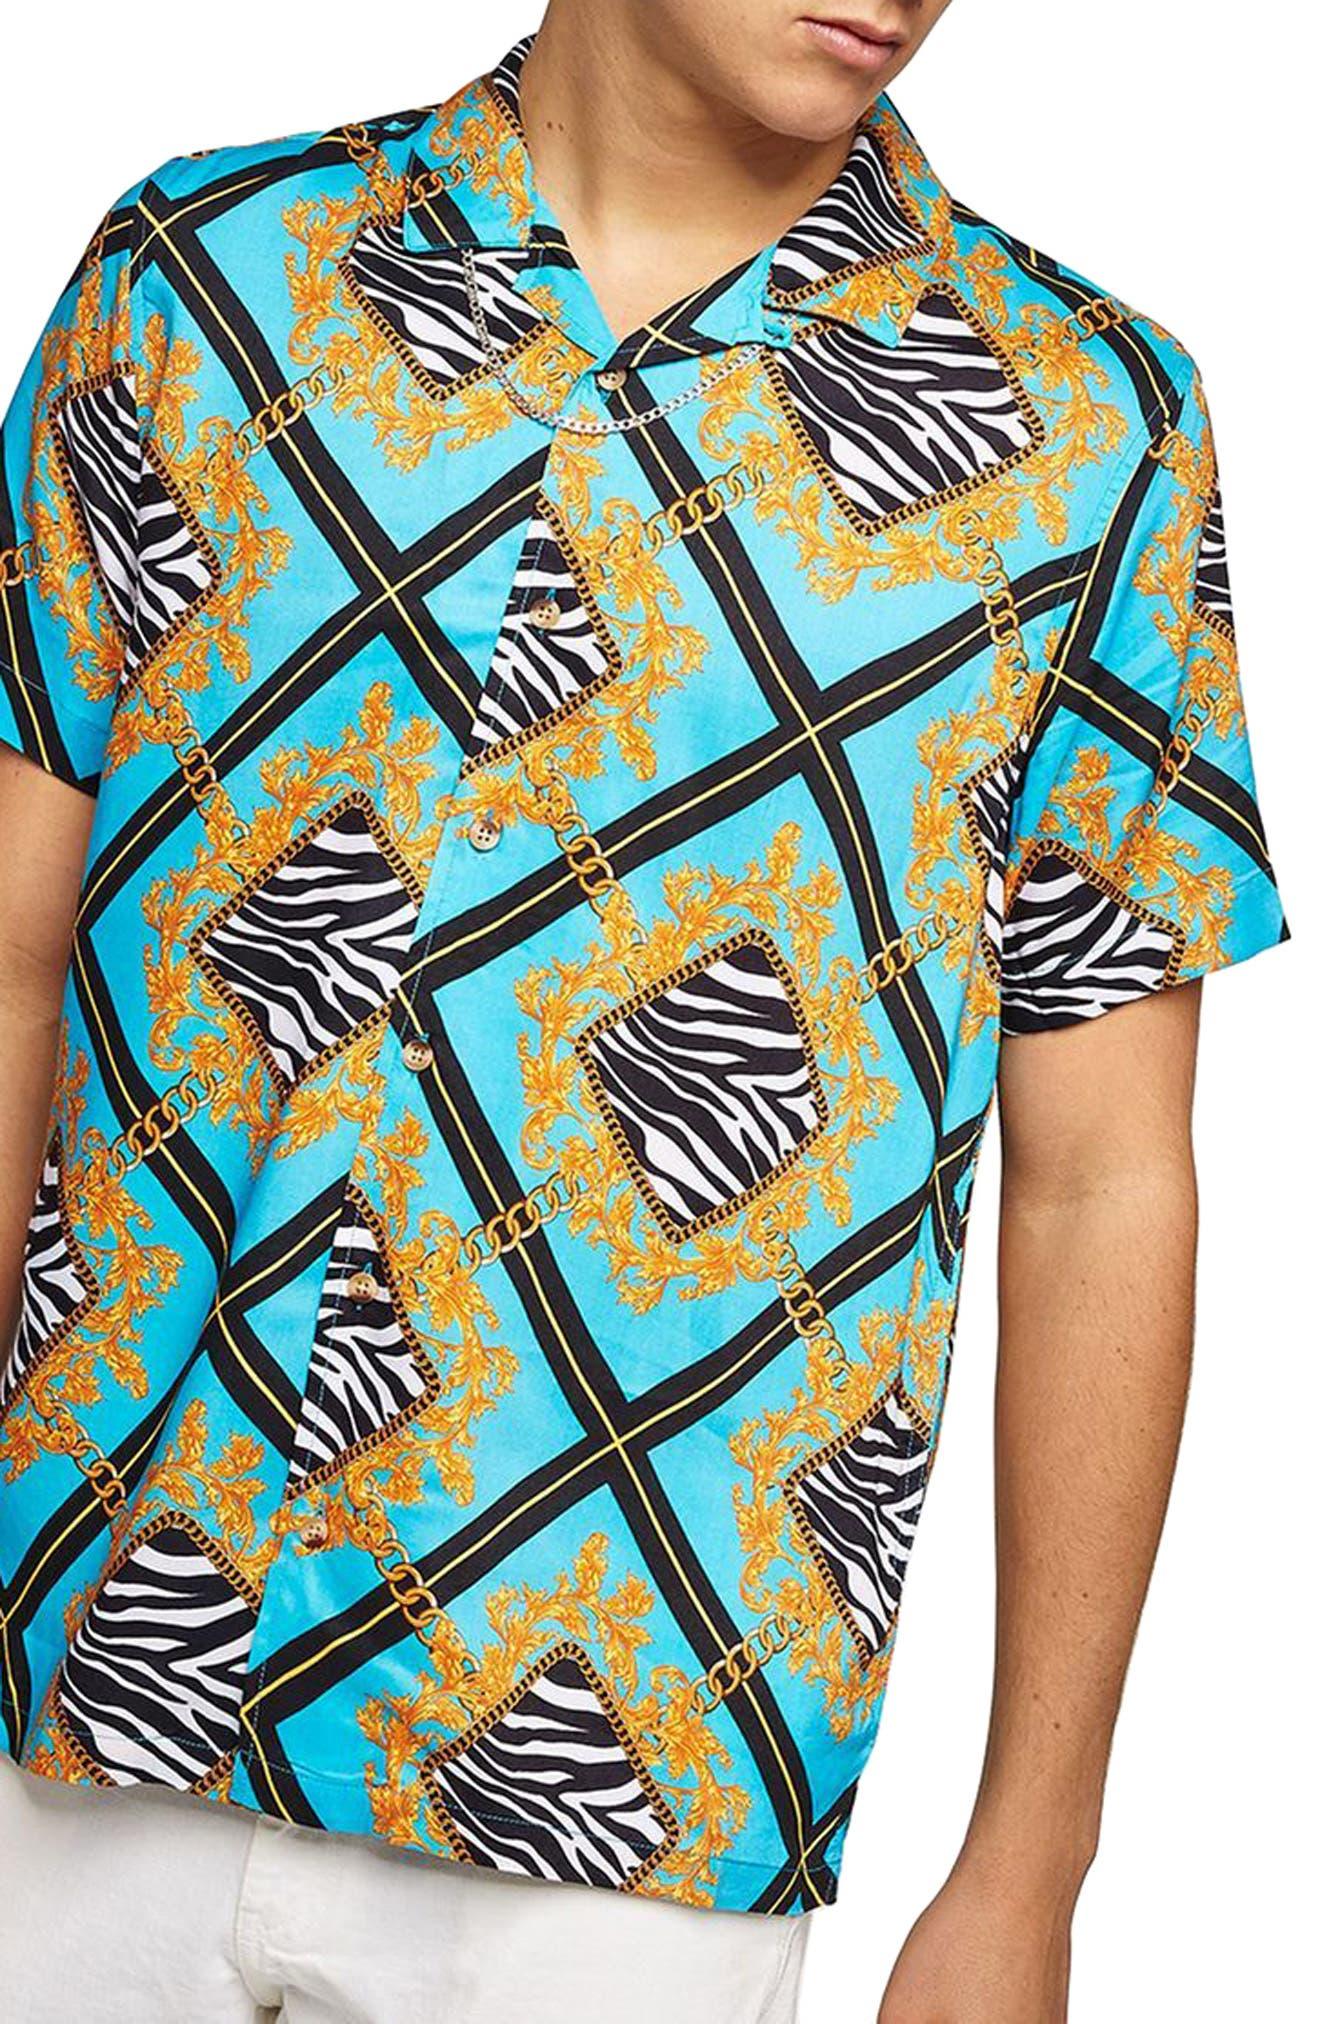 Baroque Zebra Print Shirt,                             Main thumbnail 1, color,                             Blue